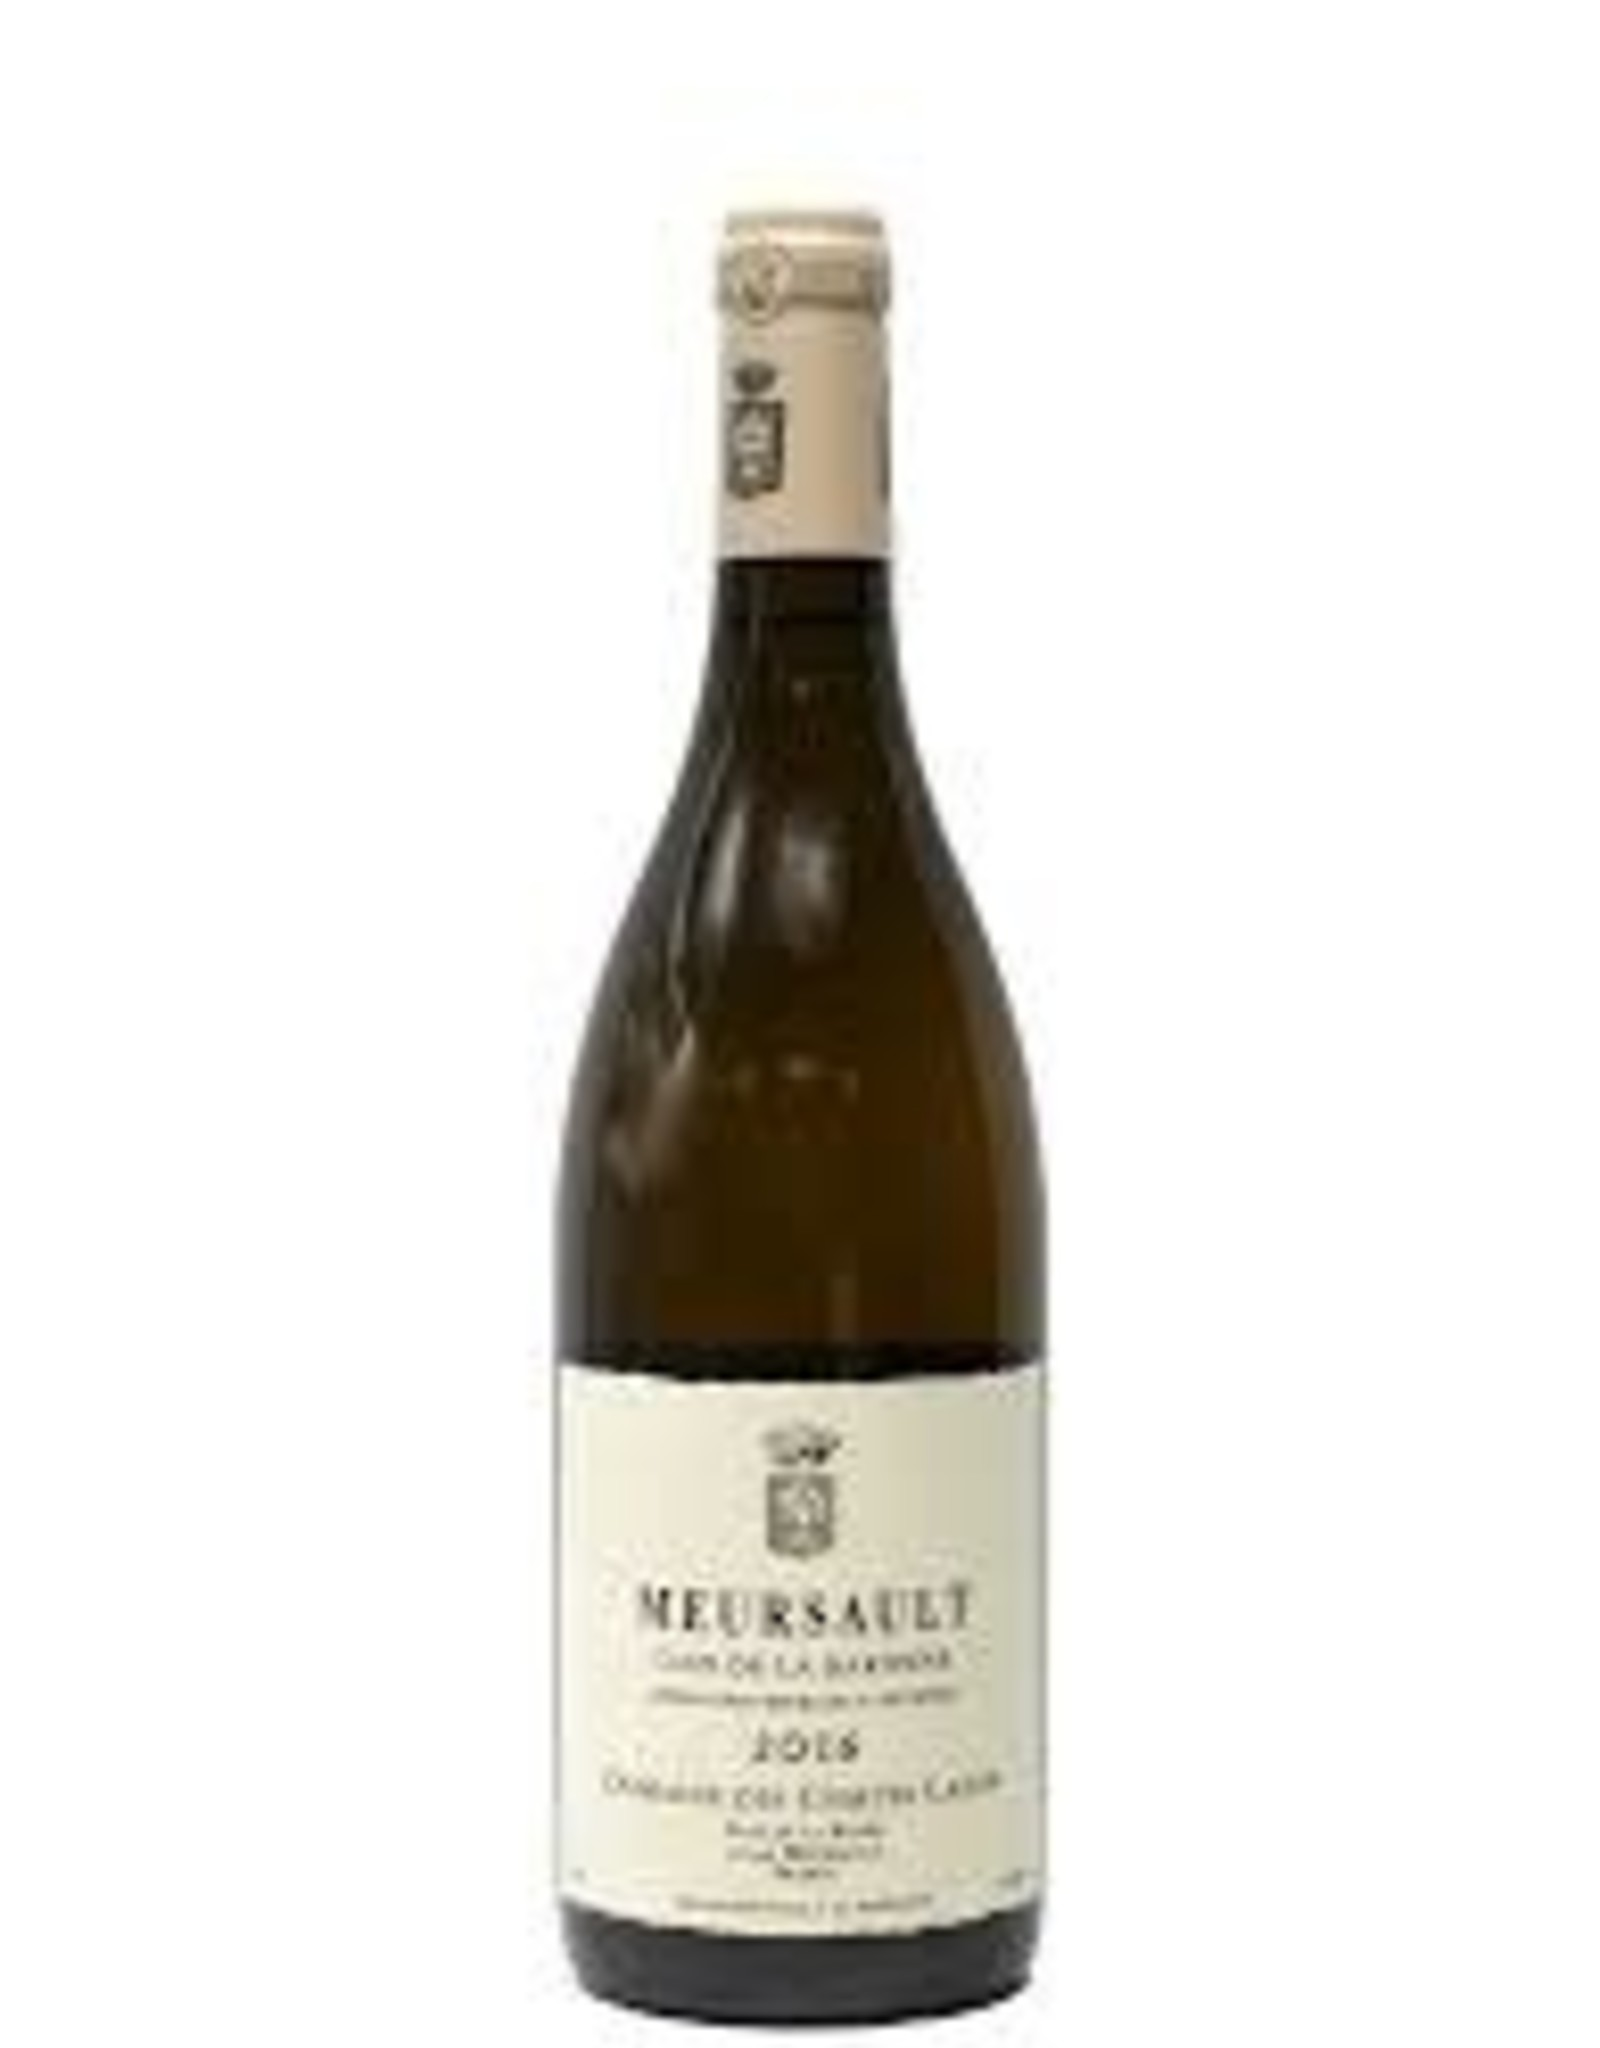 W Burgundy, Meursault, Comtes Lafon 2011 (1.5 L)